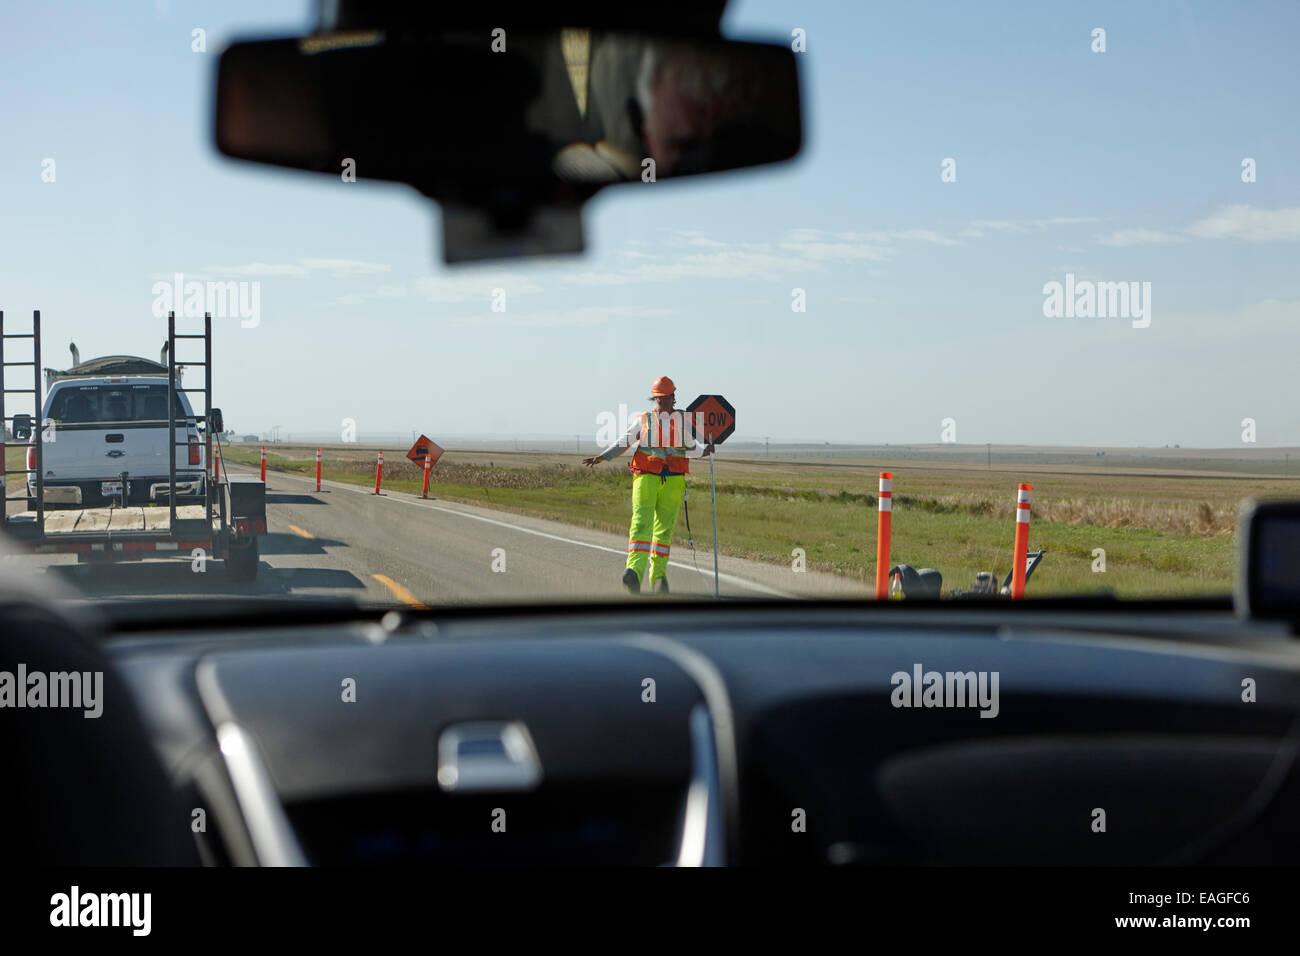 driving through highway construction work Saskatchewan Canada - Stock Image